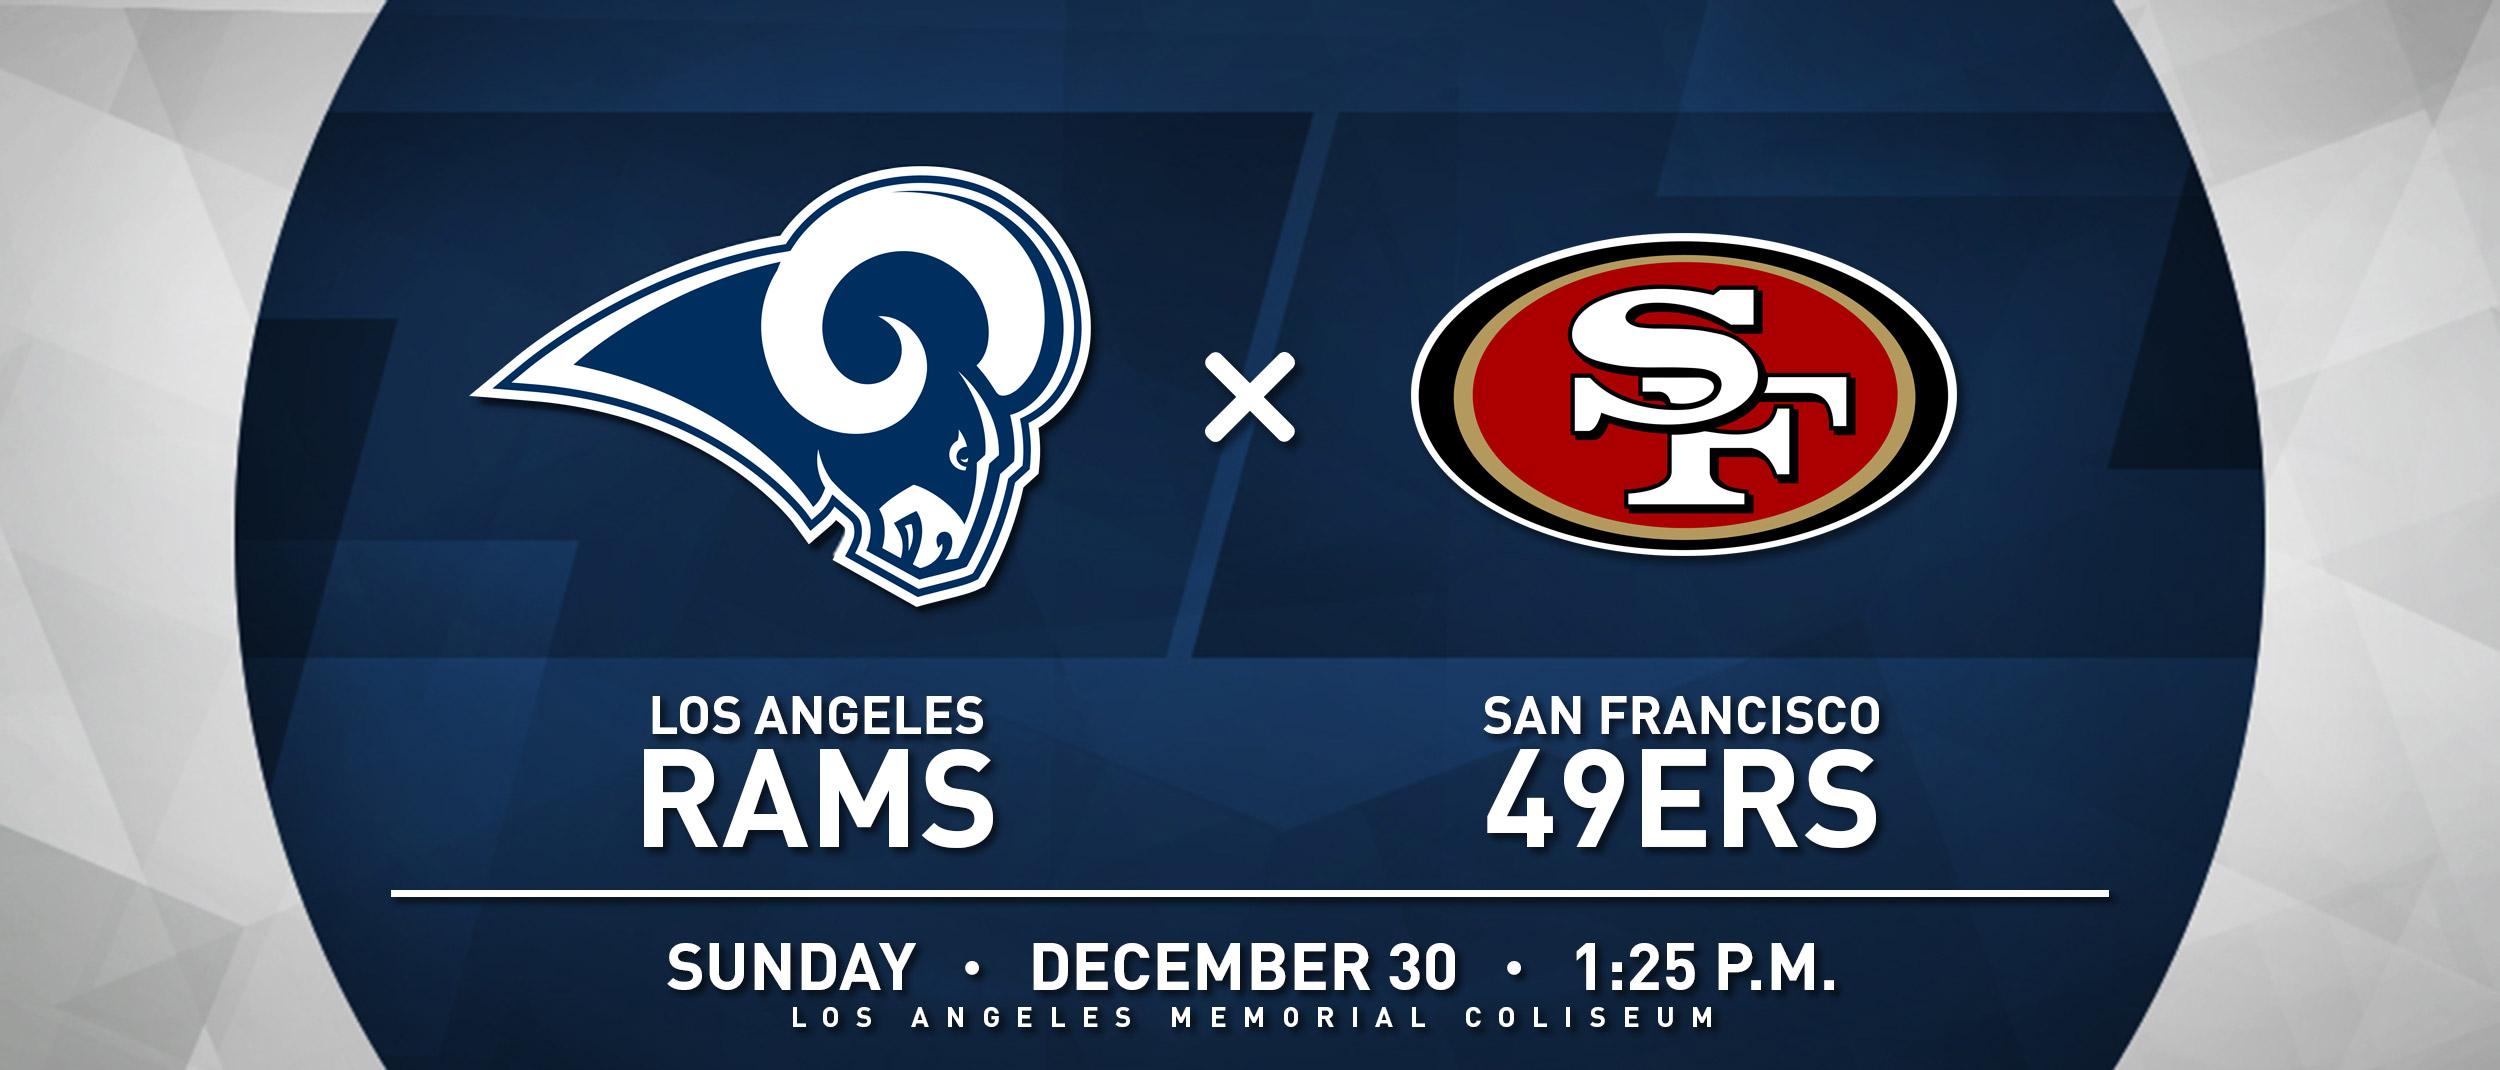 RAMS VS 49ERS